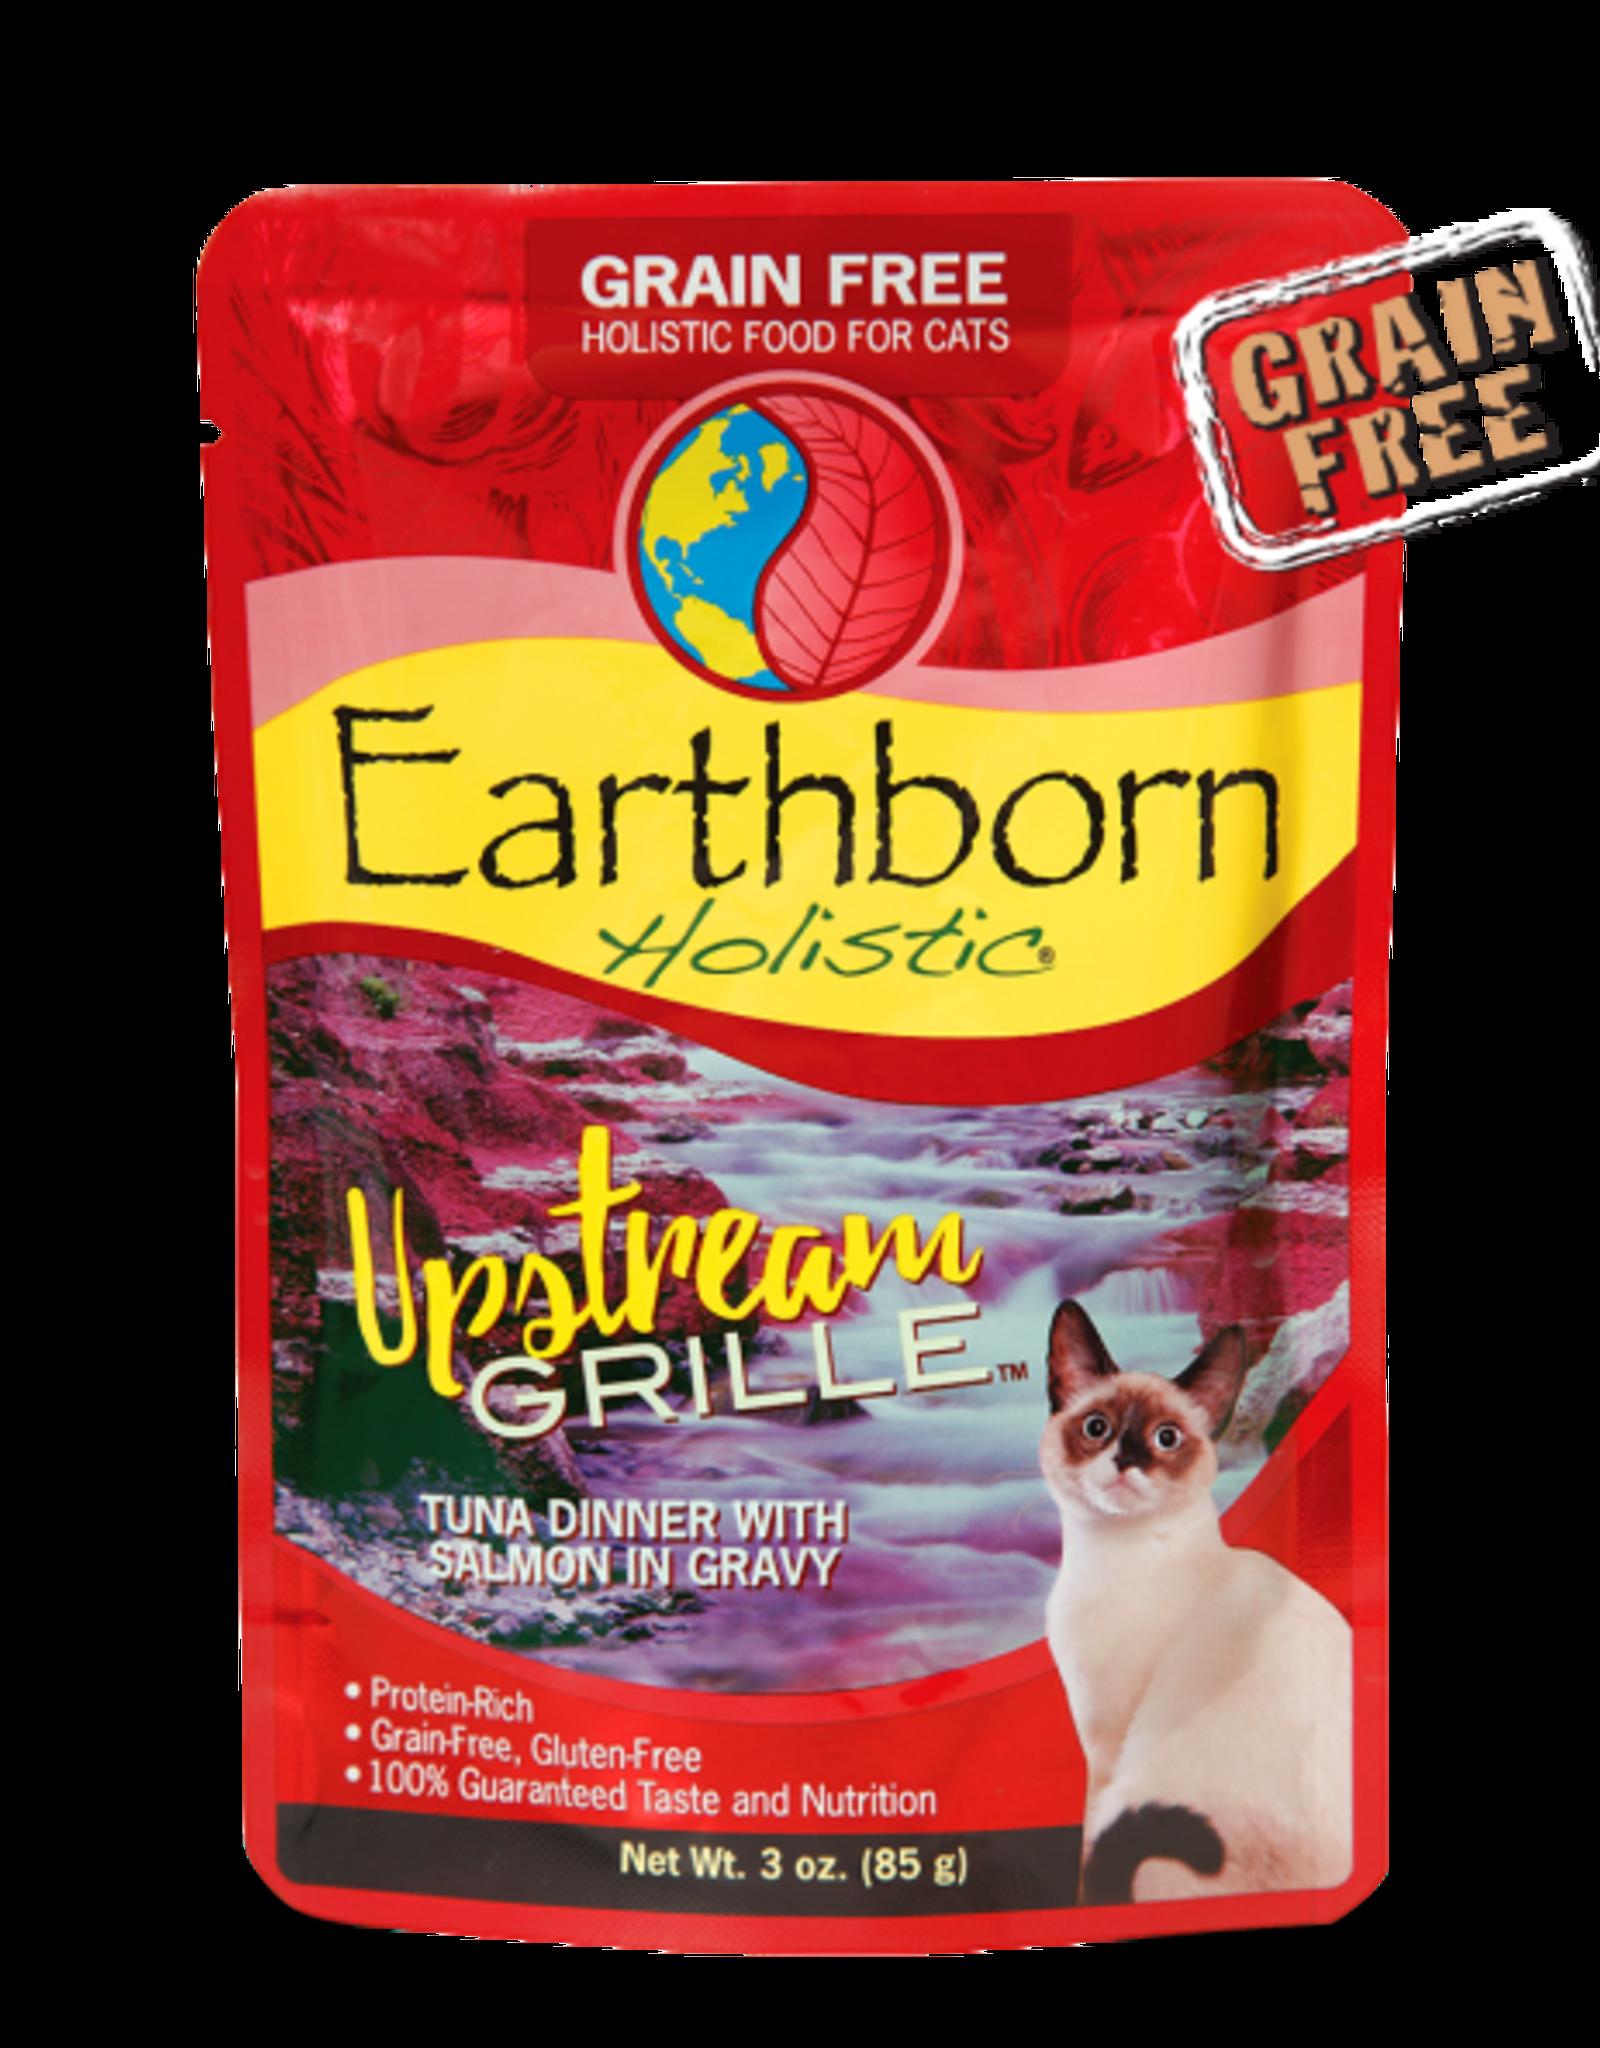 EARTHBORN EARTHBORN HOLISTIC CAT UPSTREAM GRILLE POUCH 3OZ